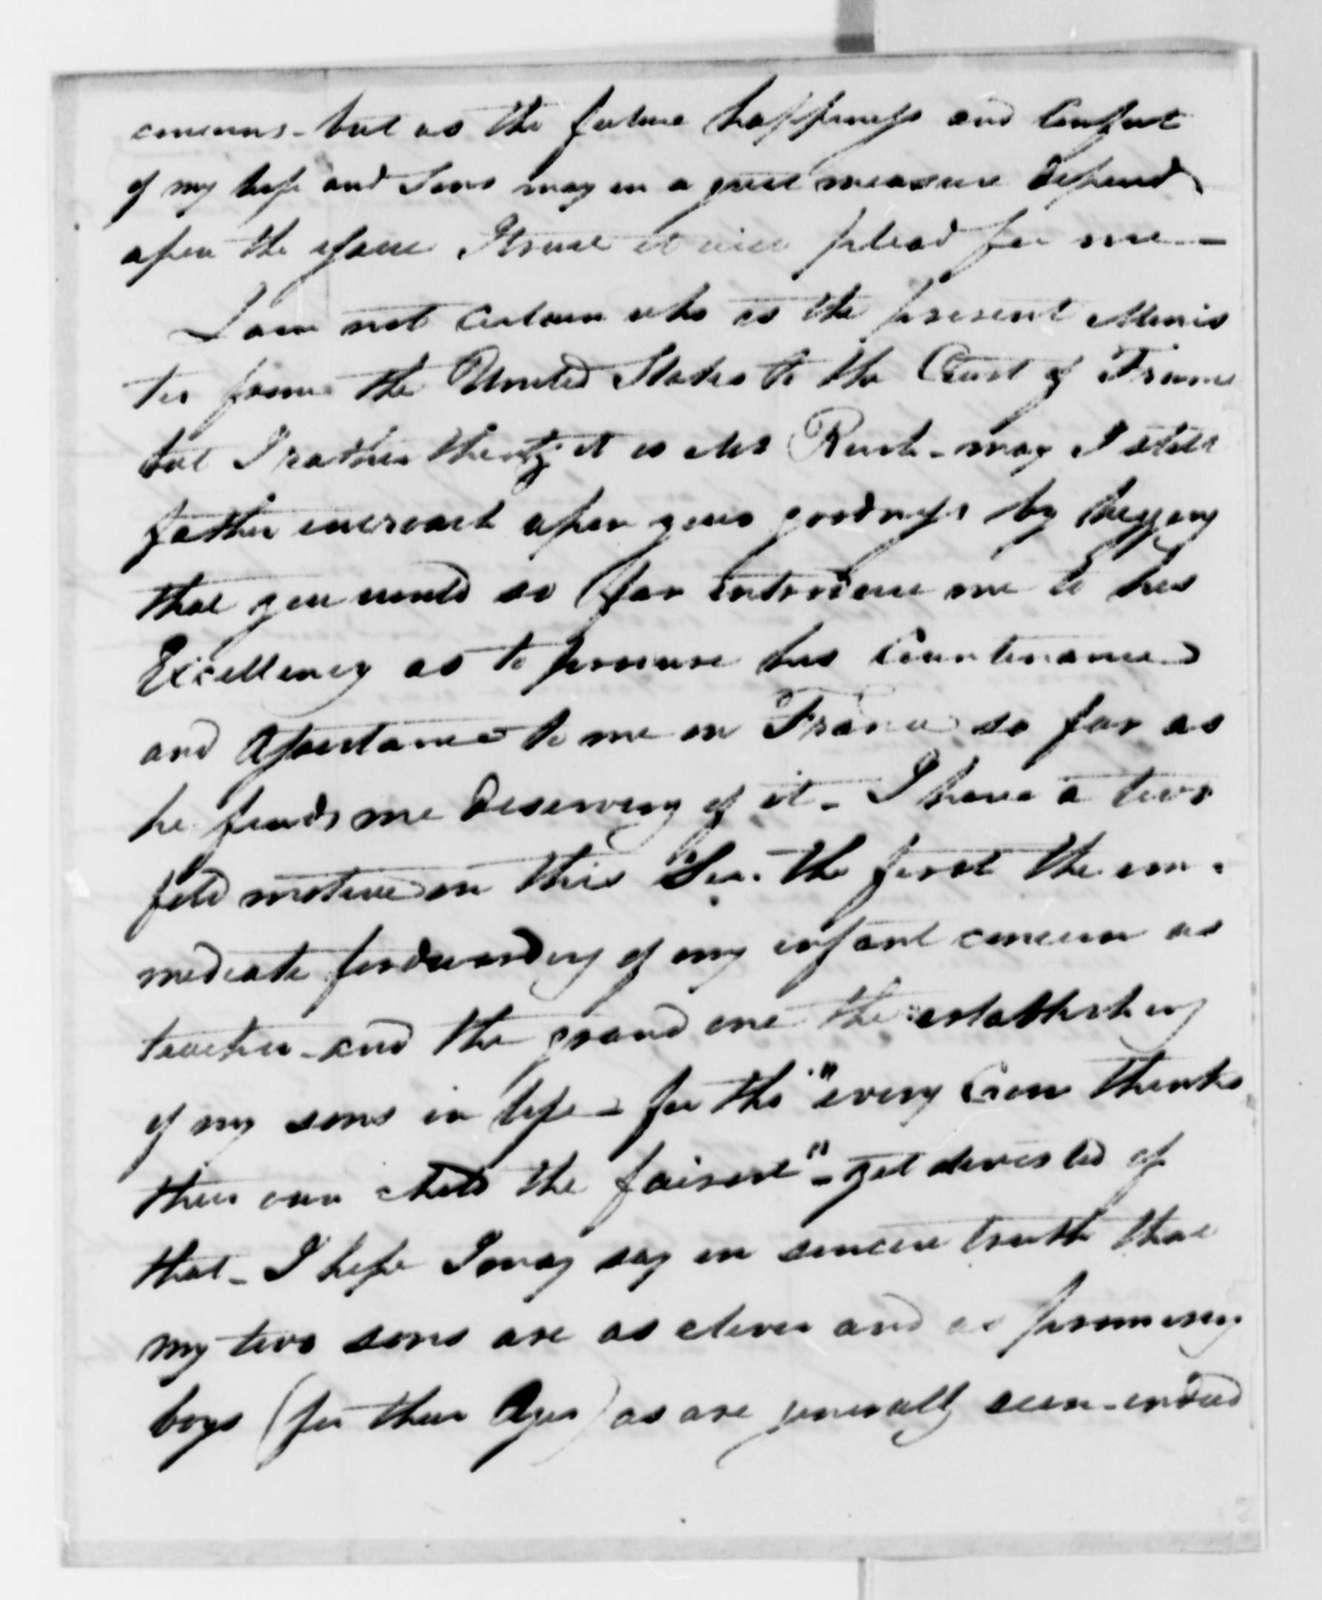 William Dorsey to Thomas Jefferson, October 7, 1825